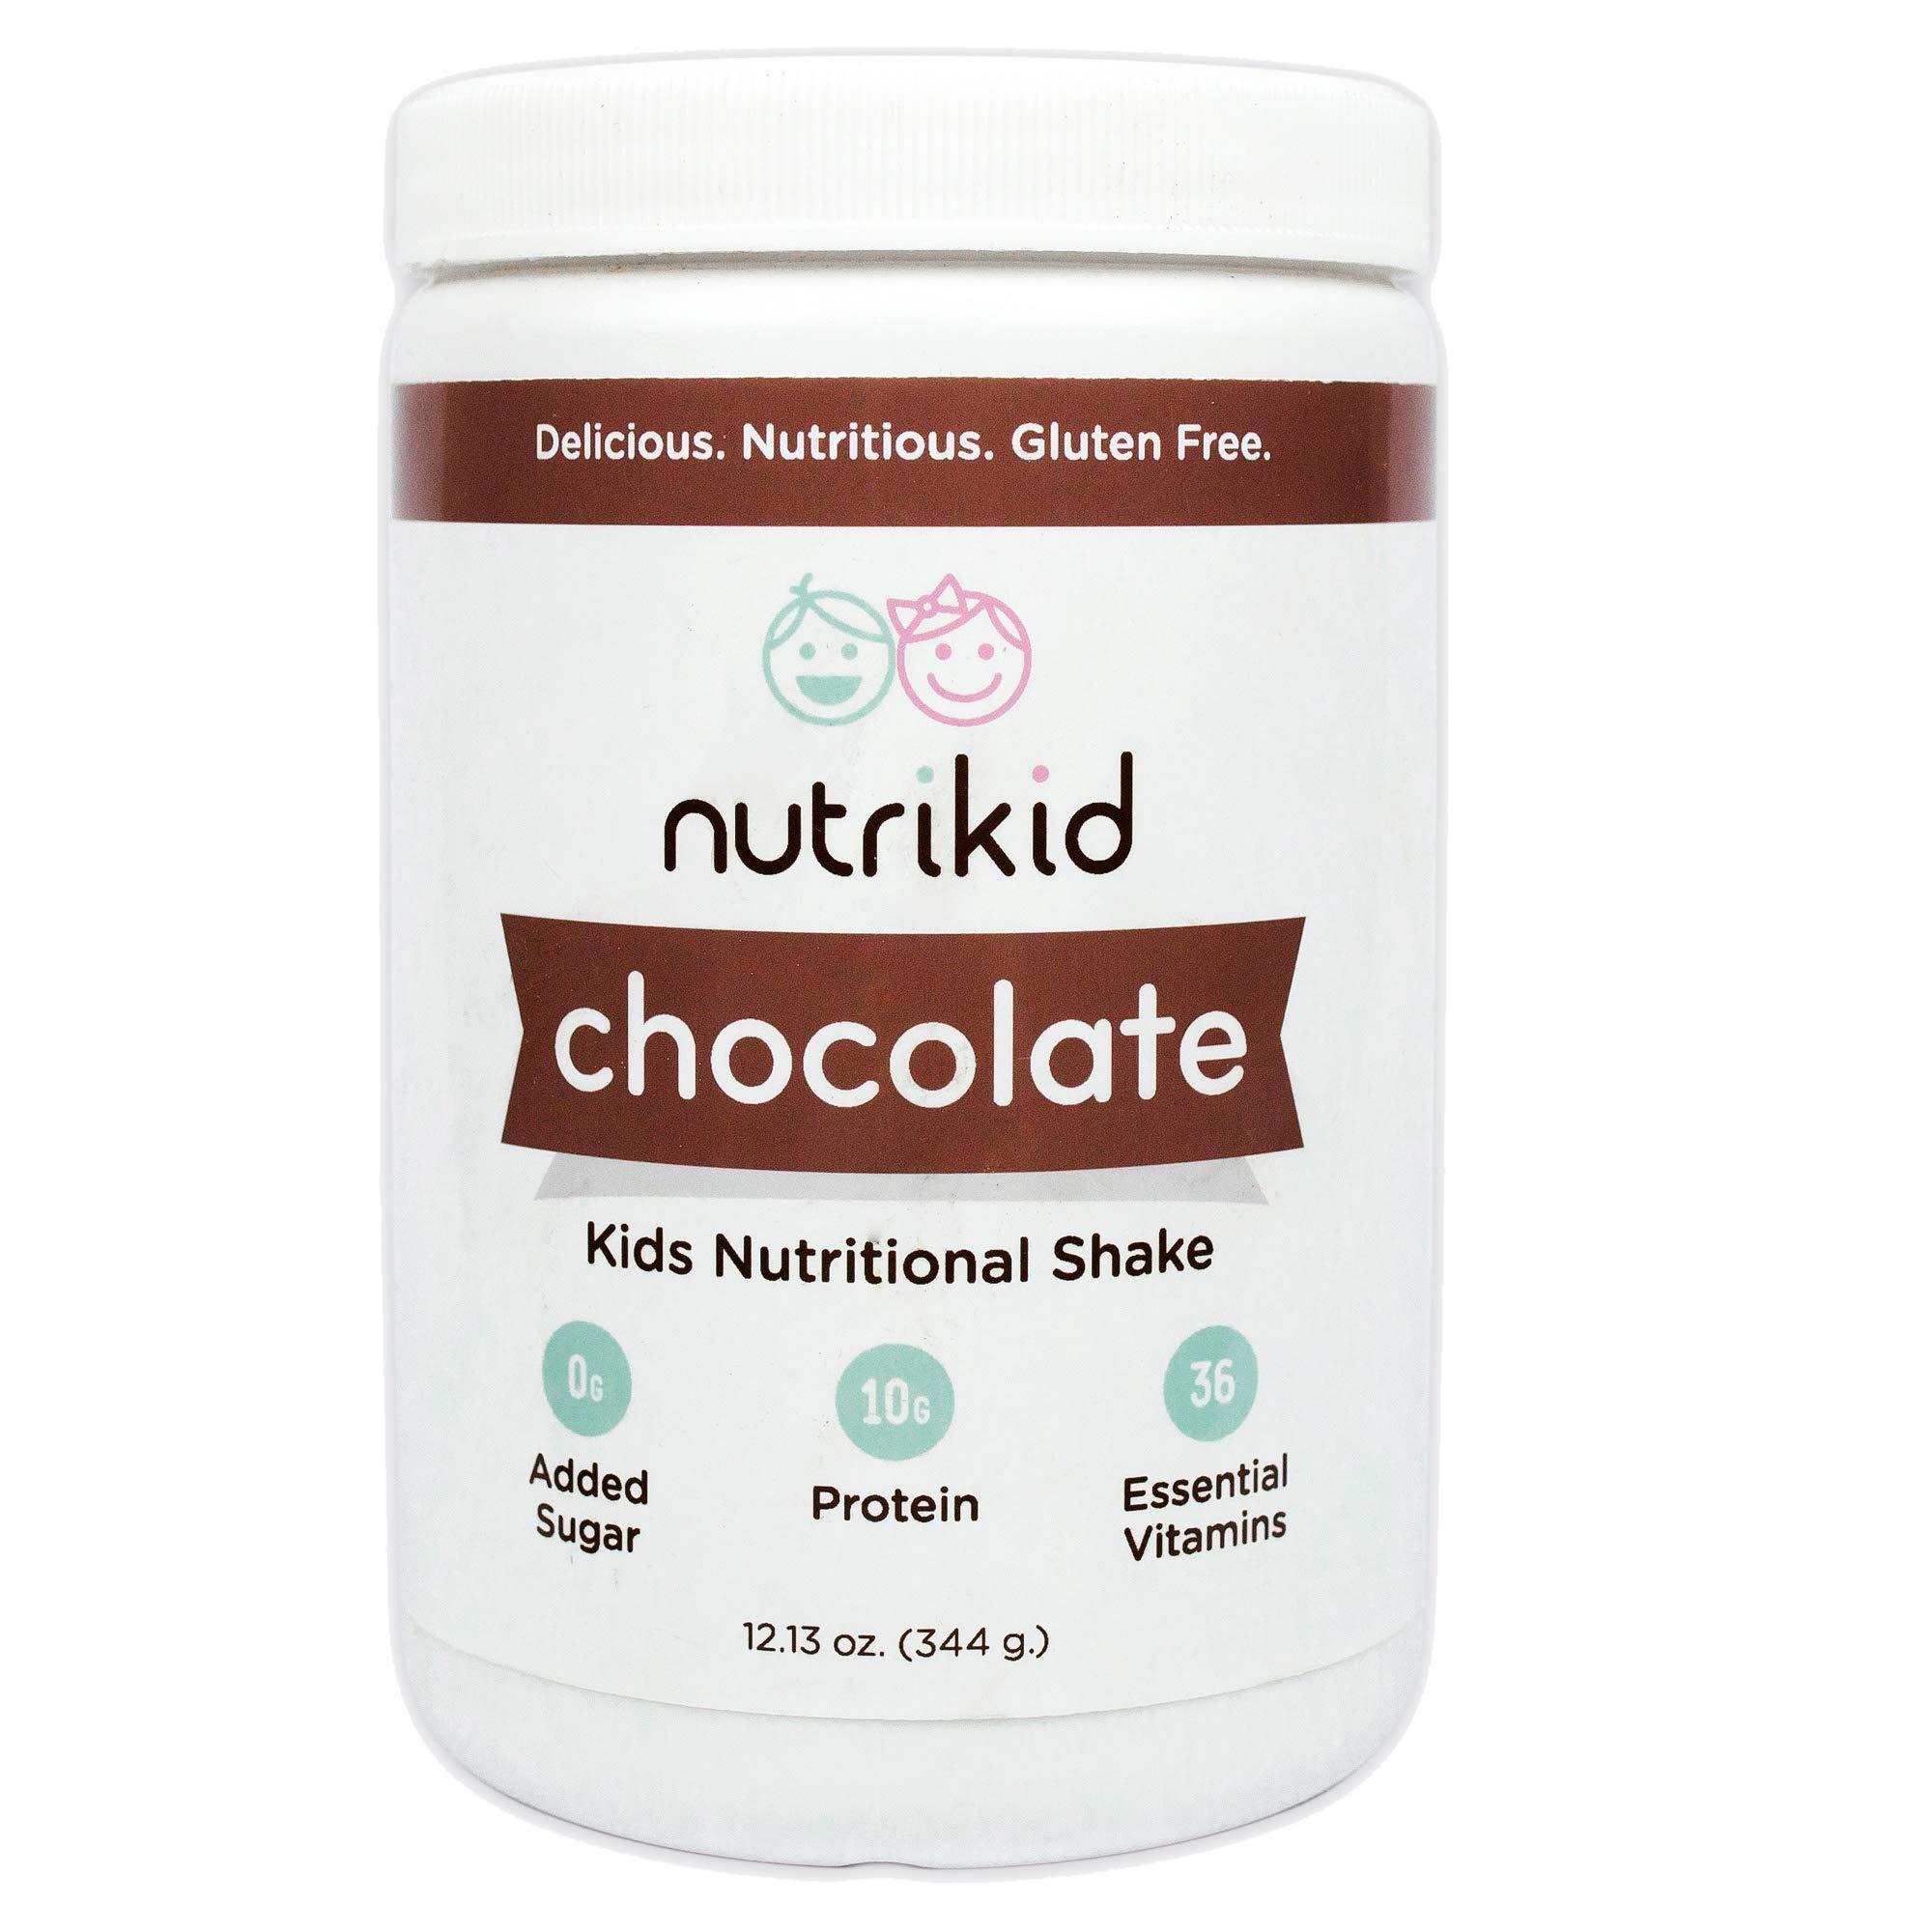 Kids Protein Shake - Nutritional Chocolate Superfood Powder With Essential Vitamins, Fiber & Digestive Enzymes - Toddler Nutrition Drink - Boost Growth, Bone Health & Brain Development - 12.13oz by NutriKid